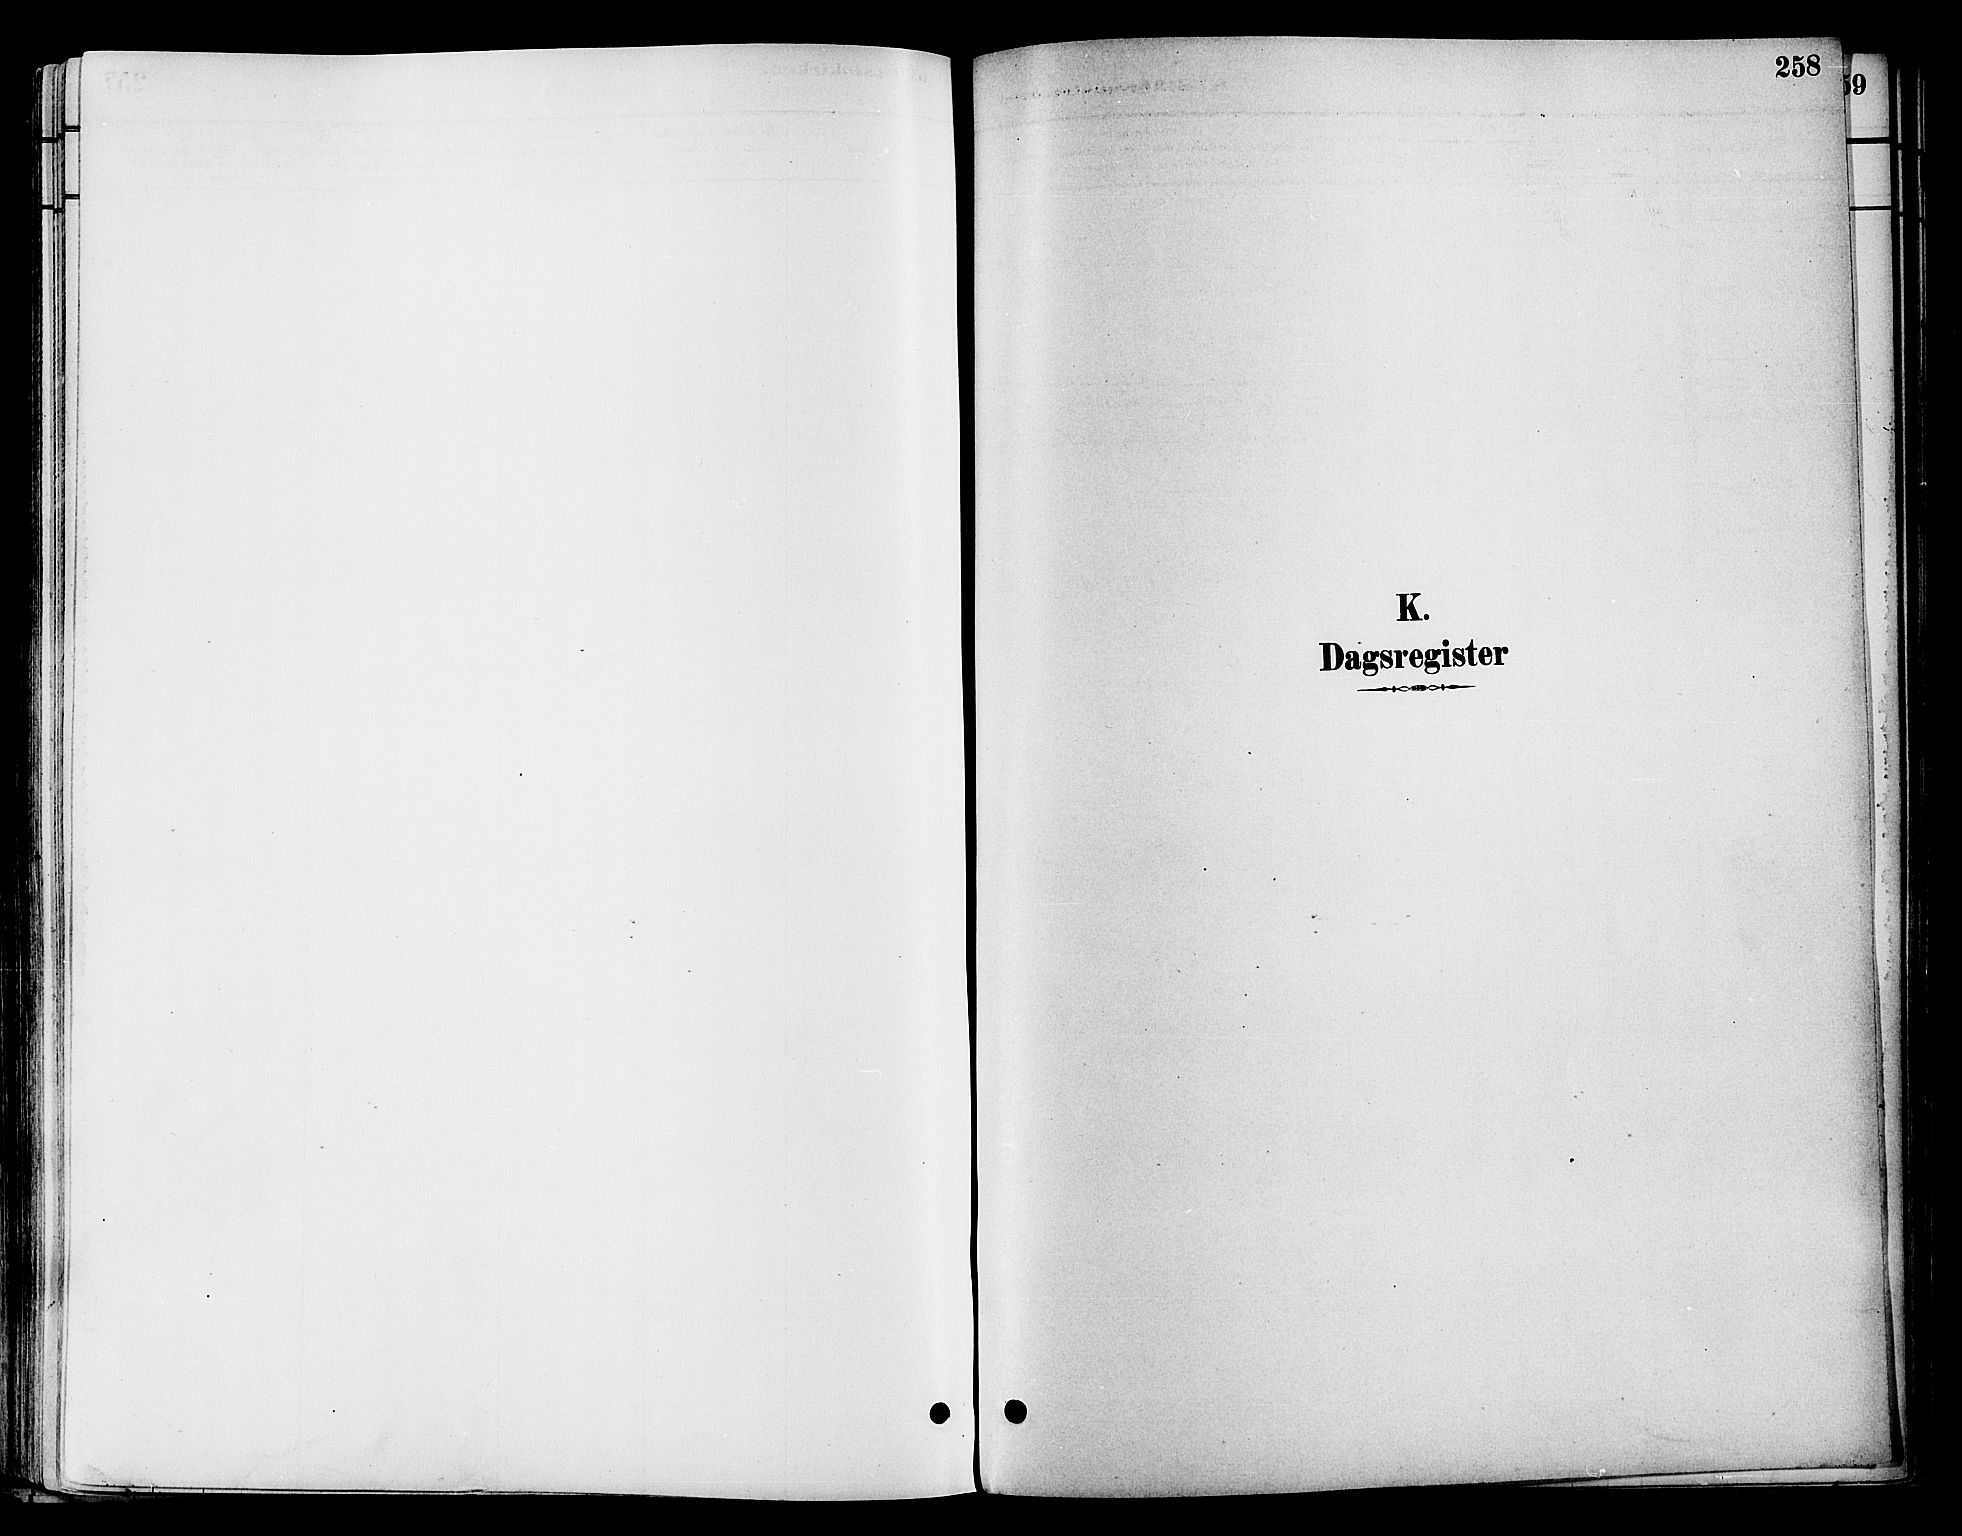 SAH, Østre Toten prestekontor, Ministerialbok nr. 7, 1881-1896, s. 258